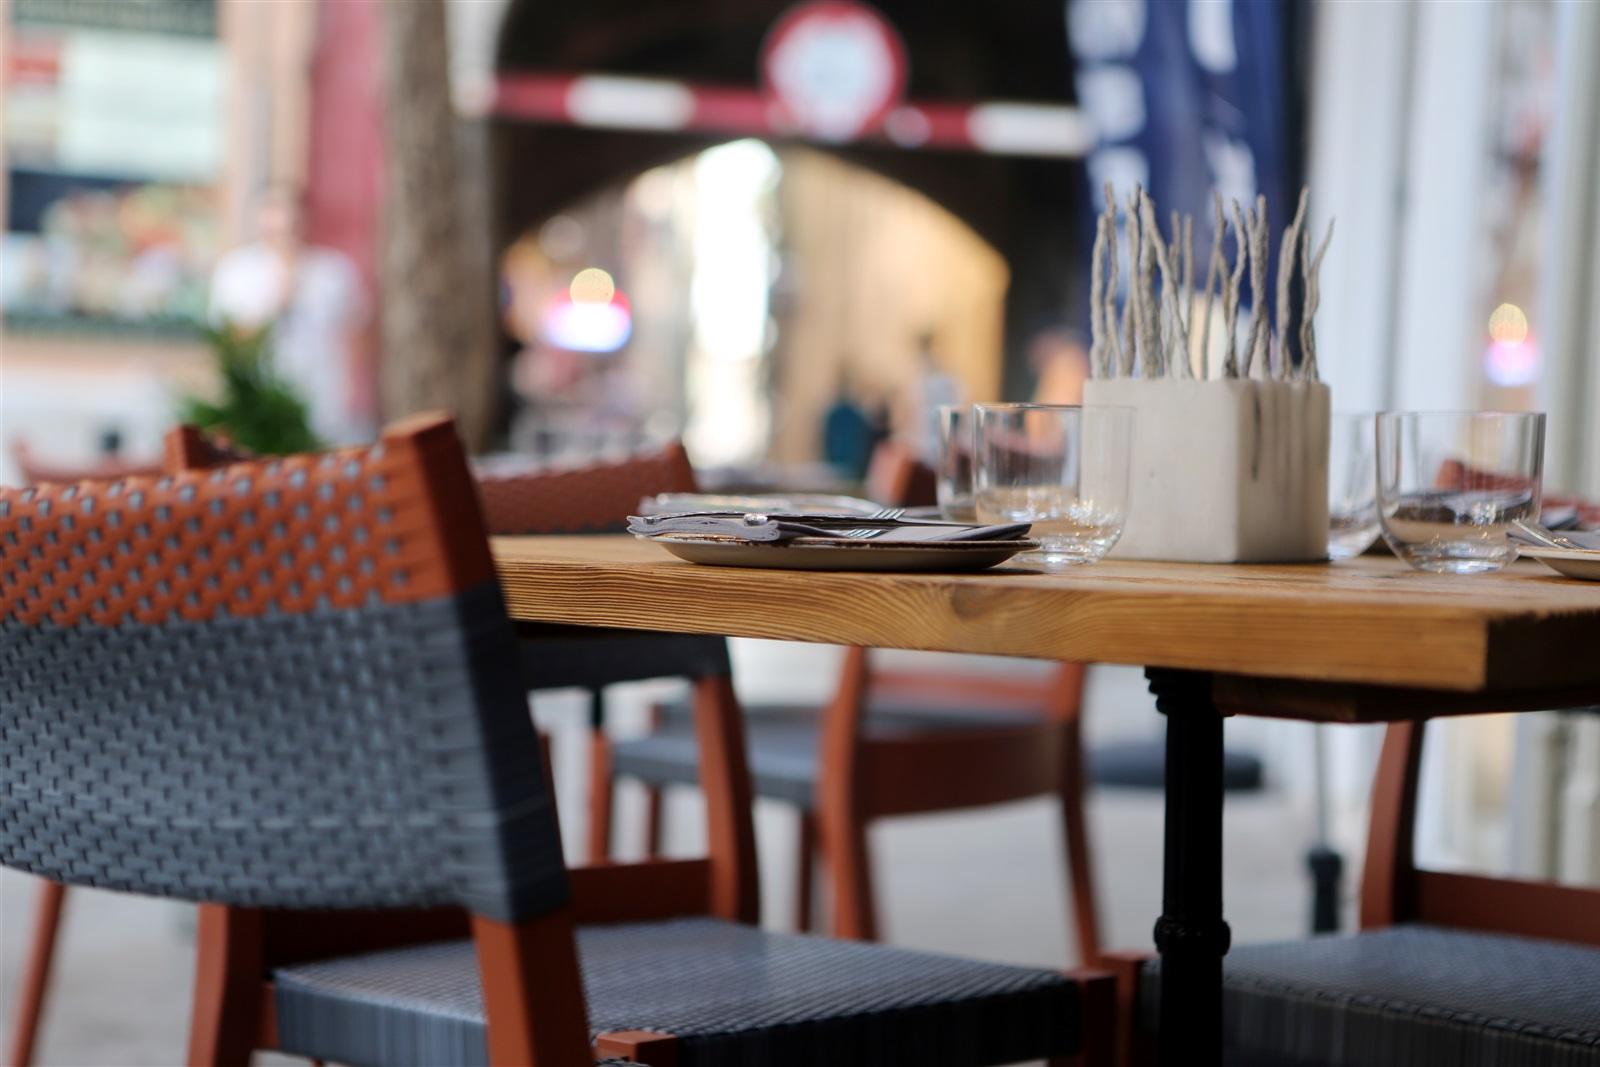 Online Scheduling for Restaurants: Part 2